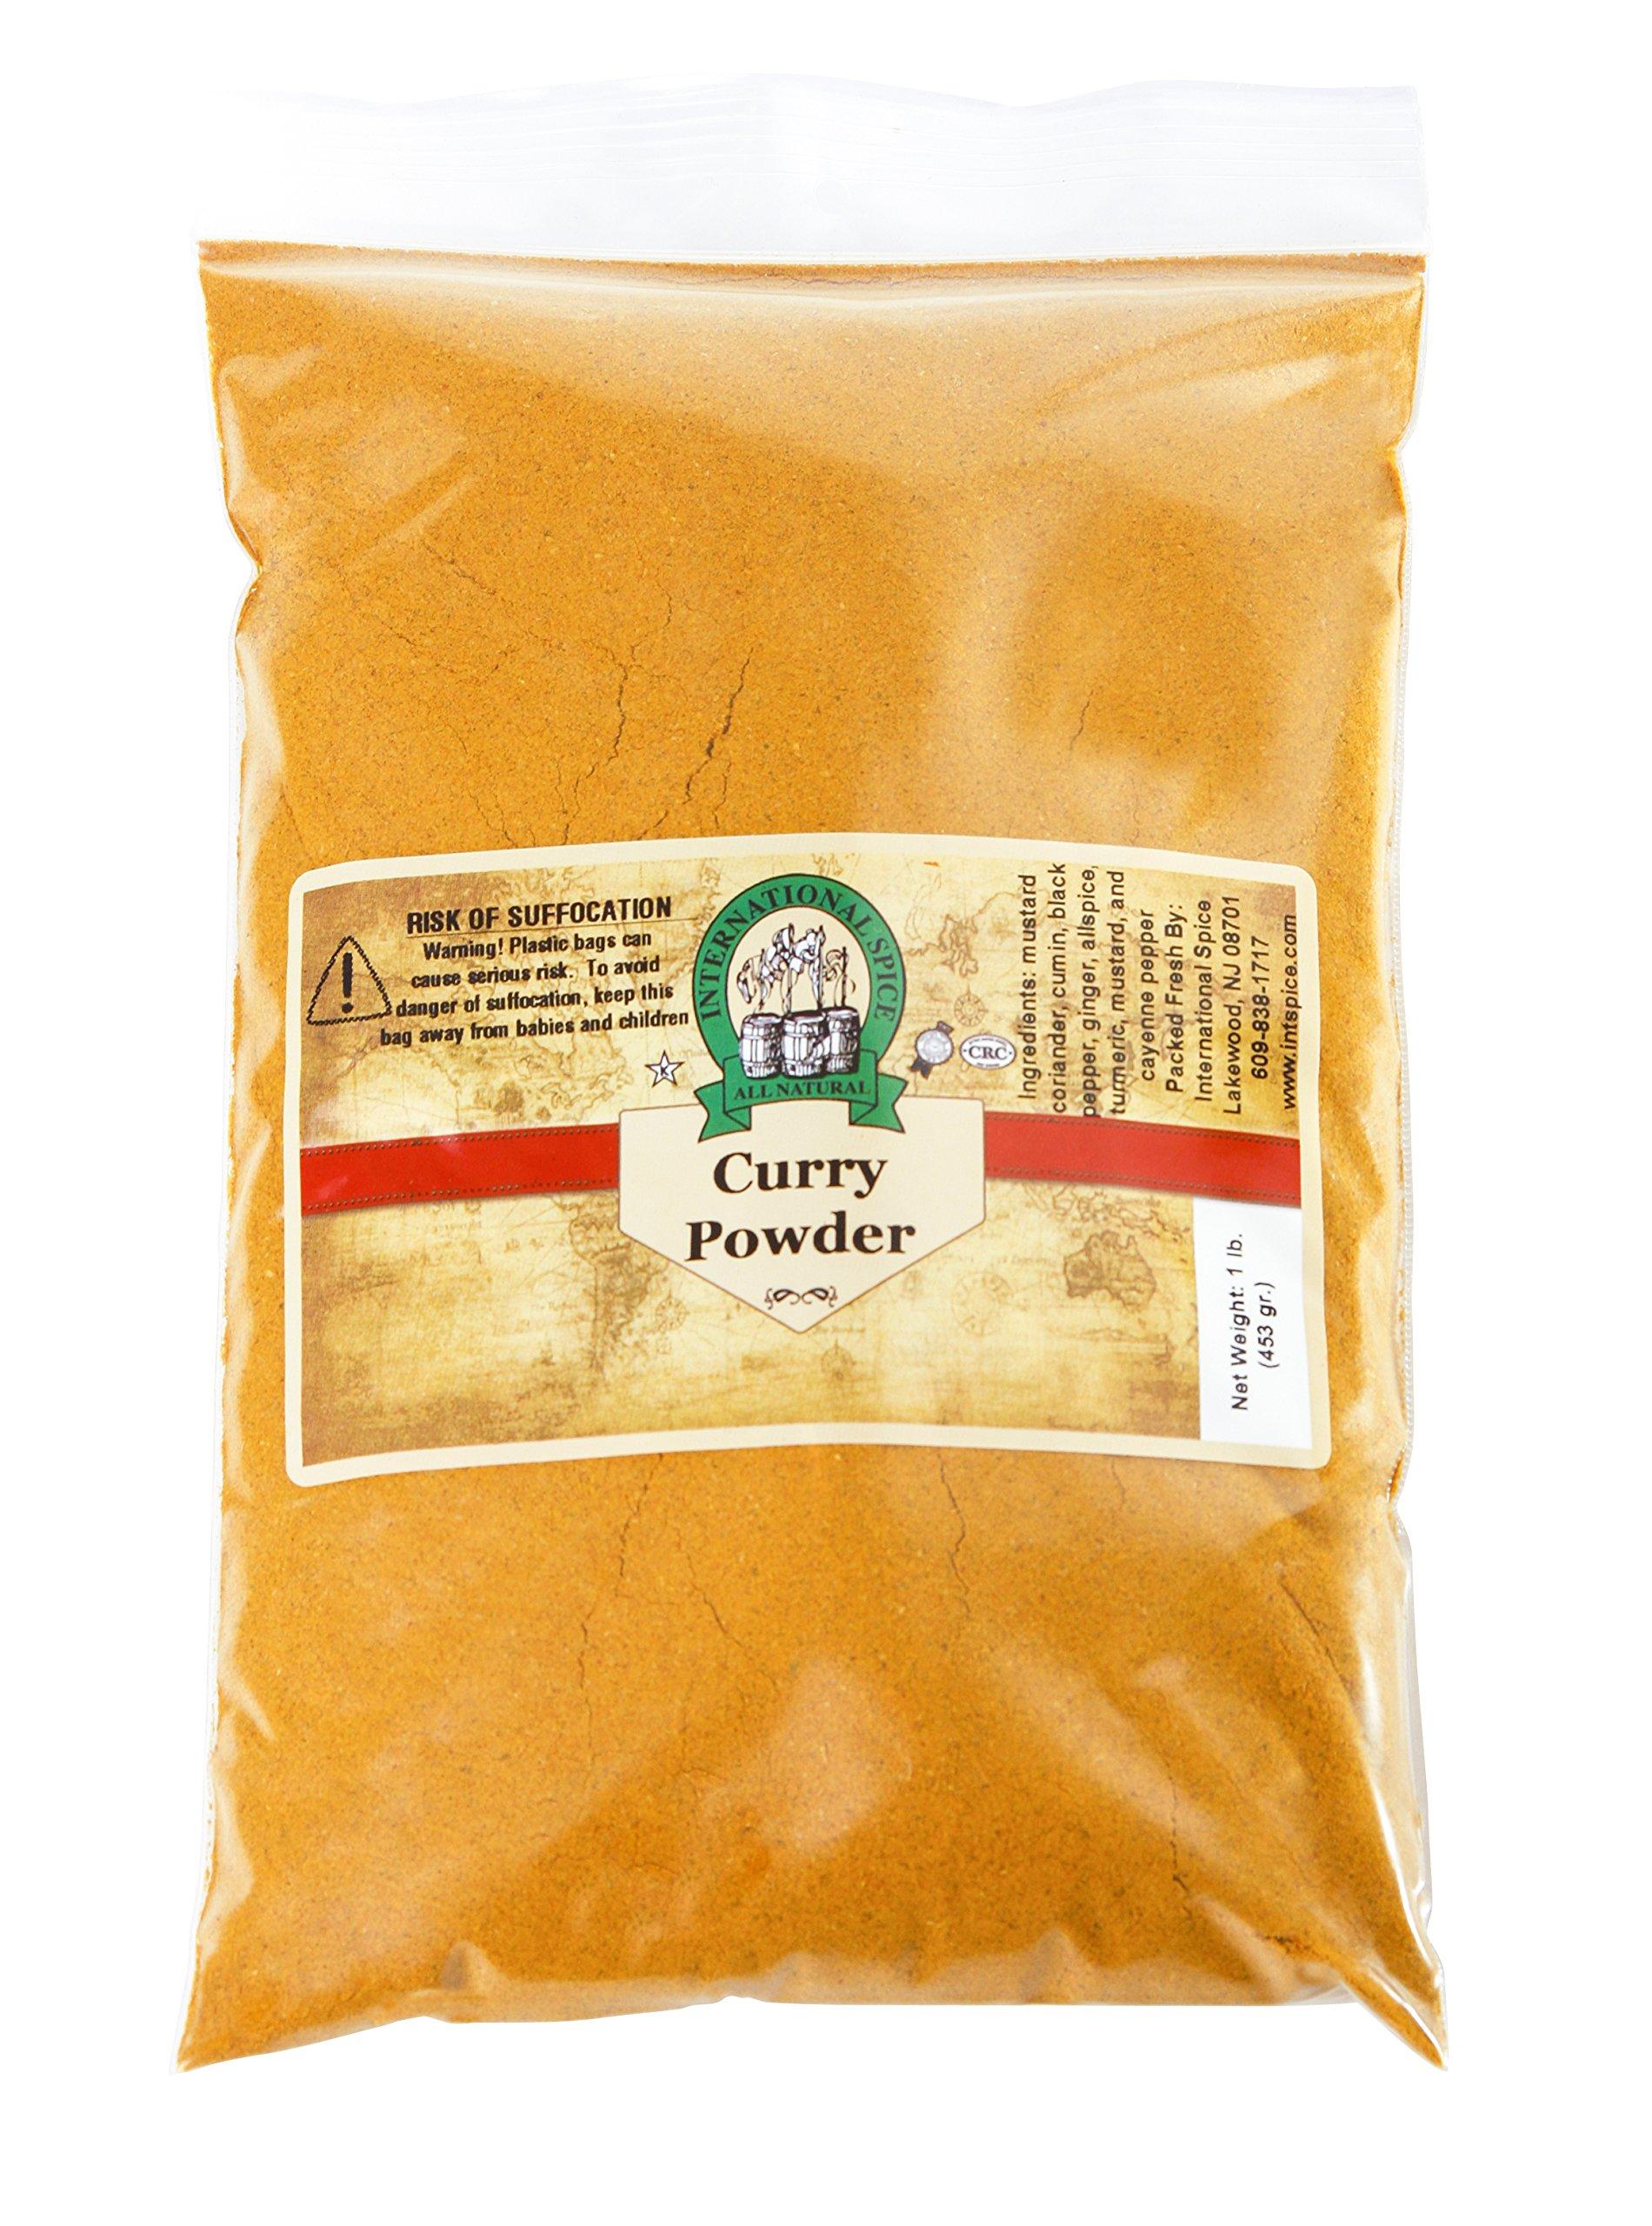 International Spice Premium Gourmet Spices- CURRY POWDER-: 16 OZ